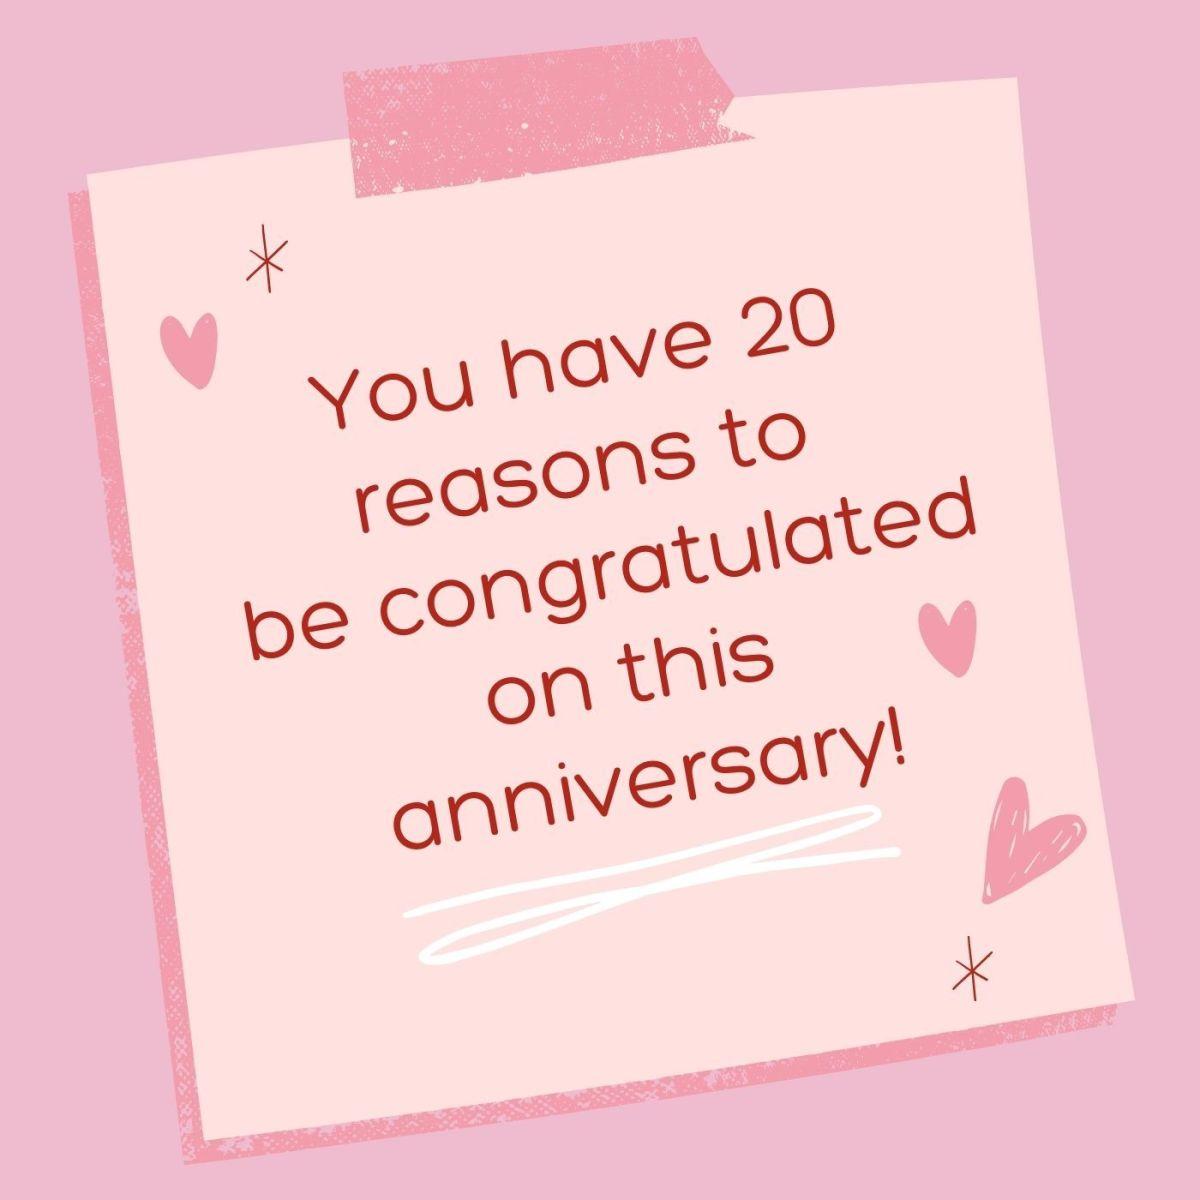 Hope you get 20 more reasons.